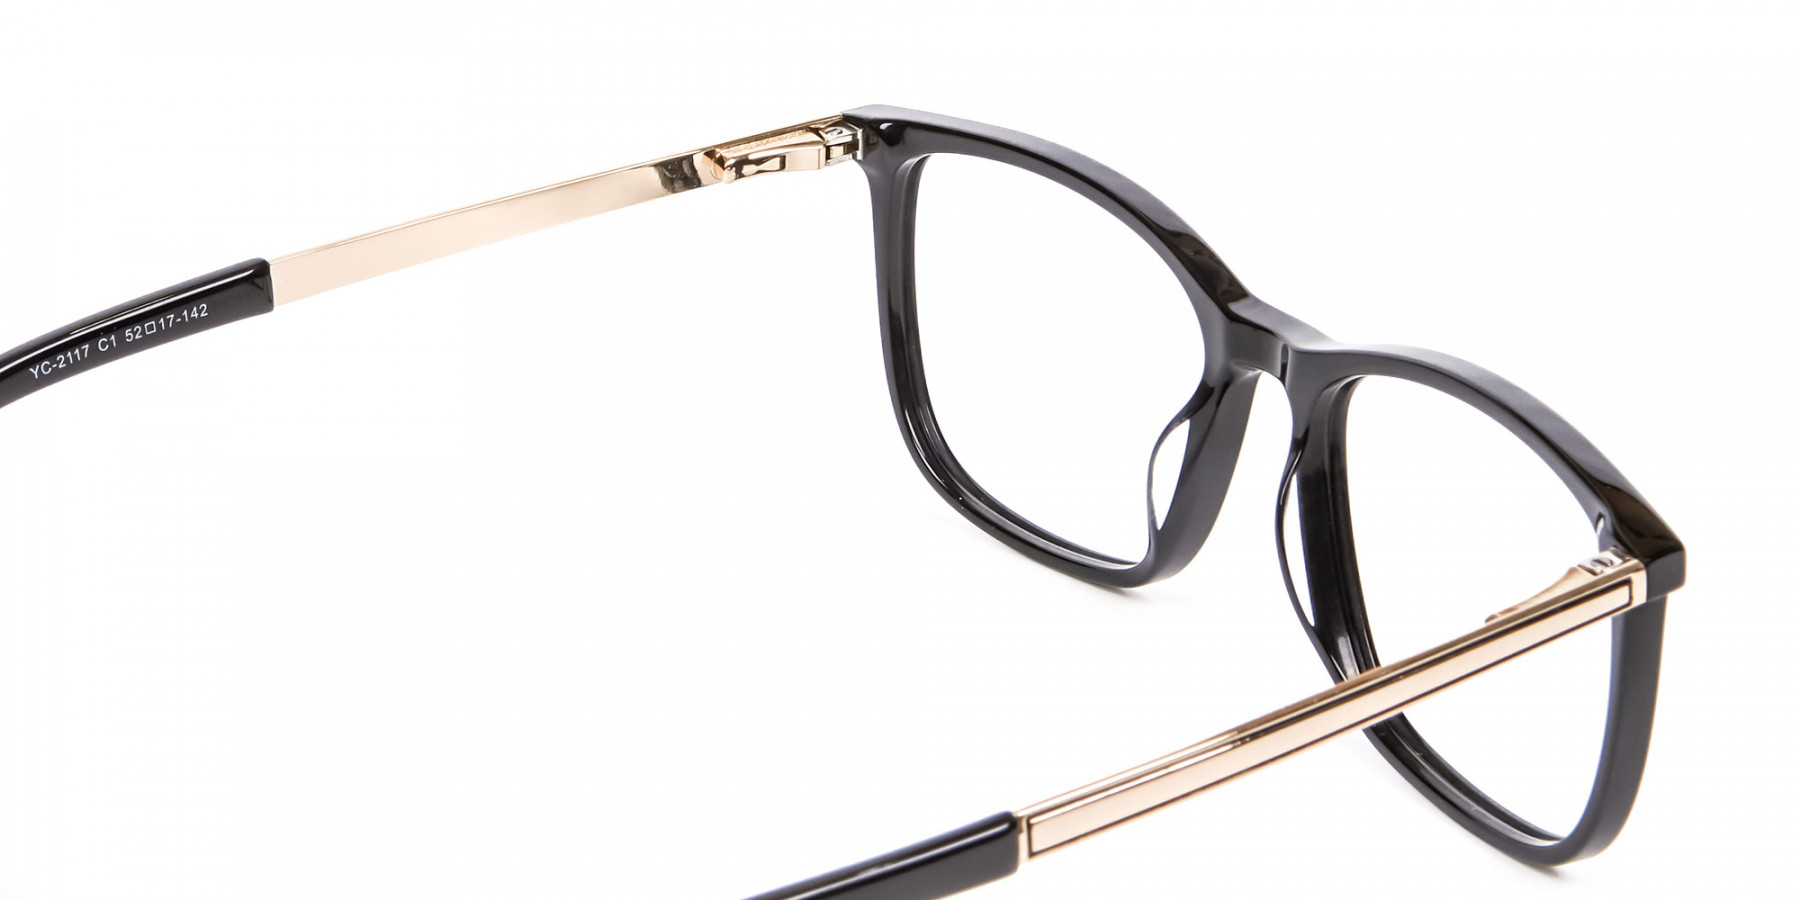 Black and Gold Multi-Material Frame in Wayfarer- 1